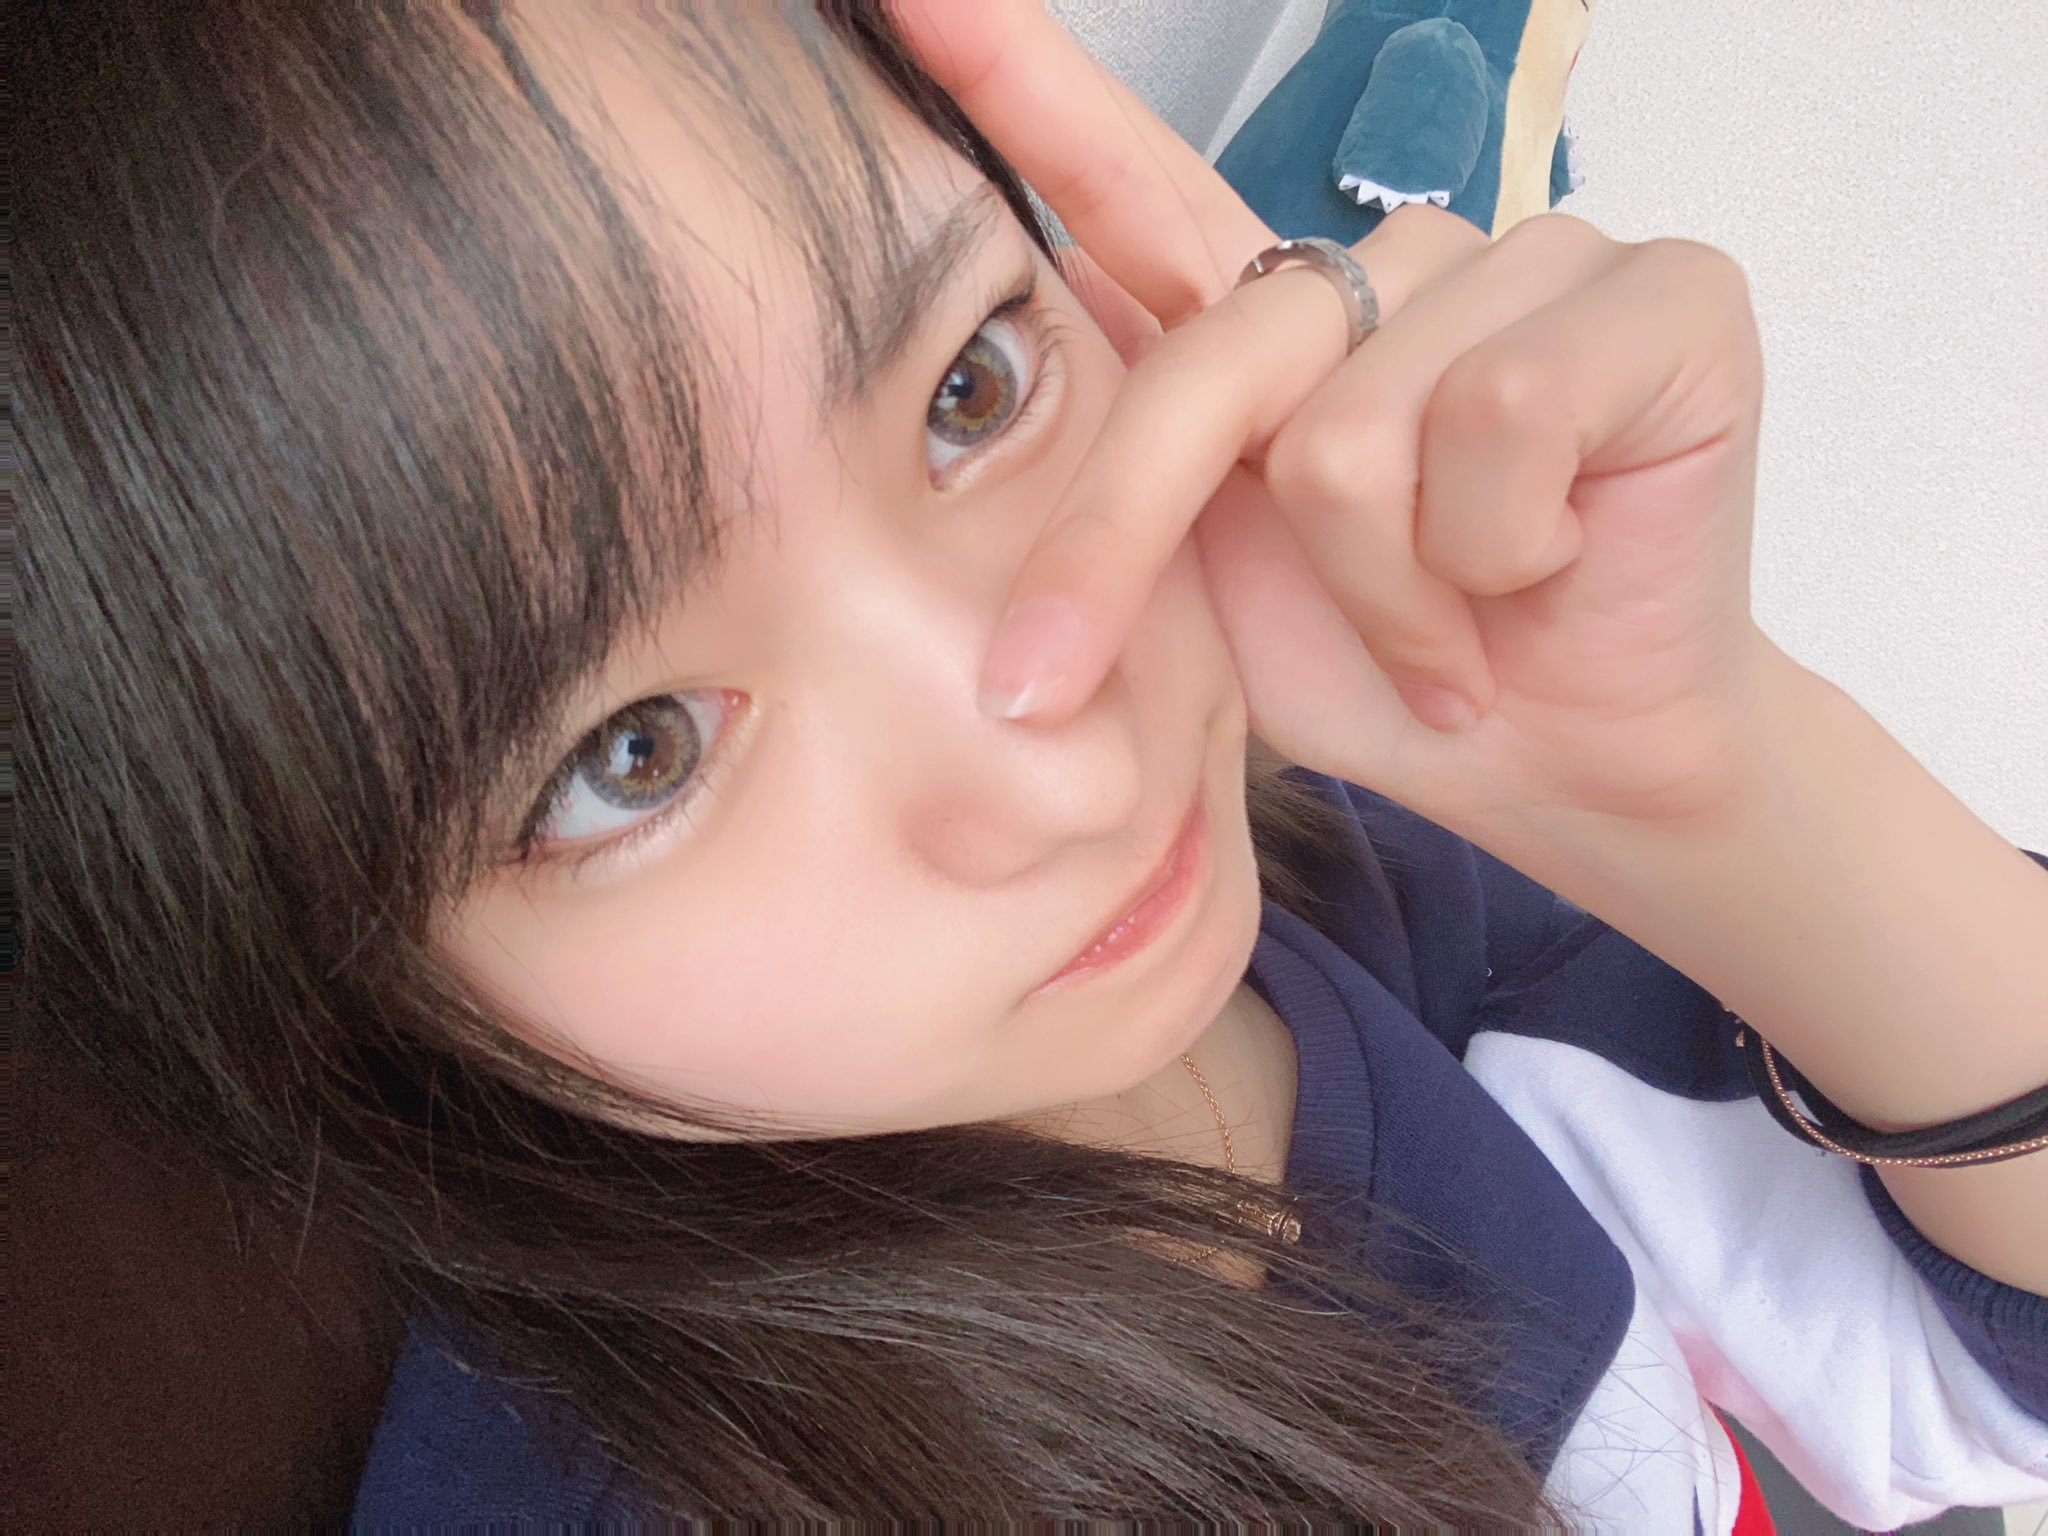 nagisa_micky 1252451859857620993_p0